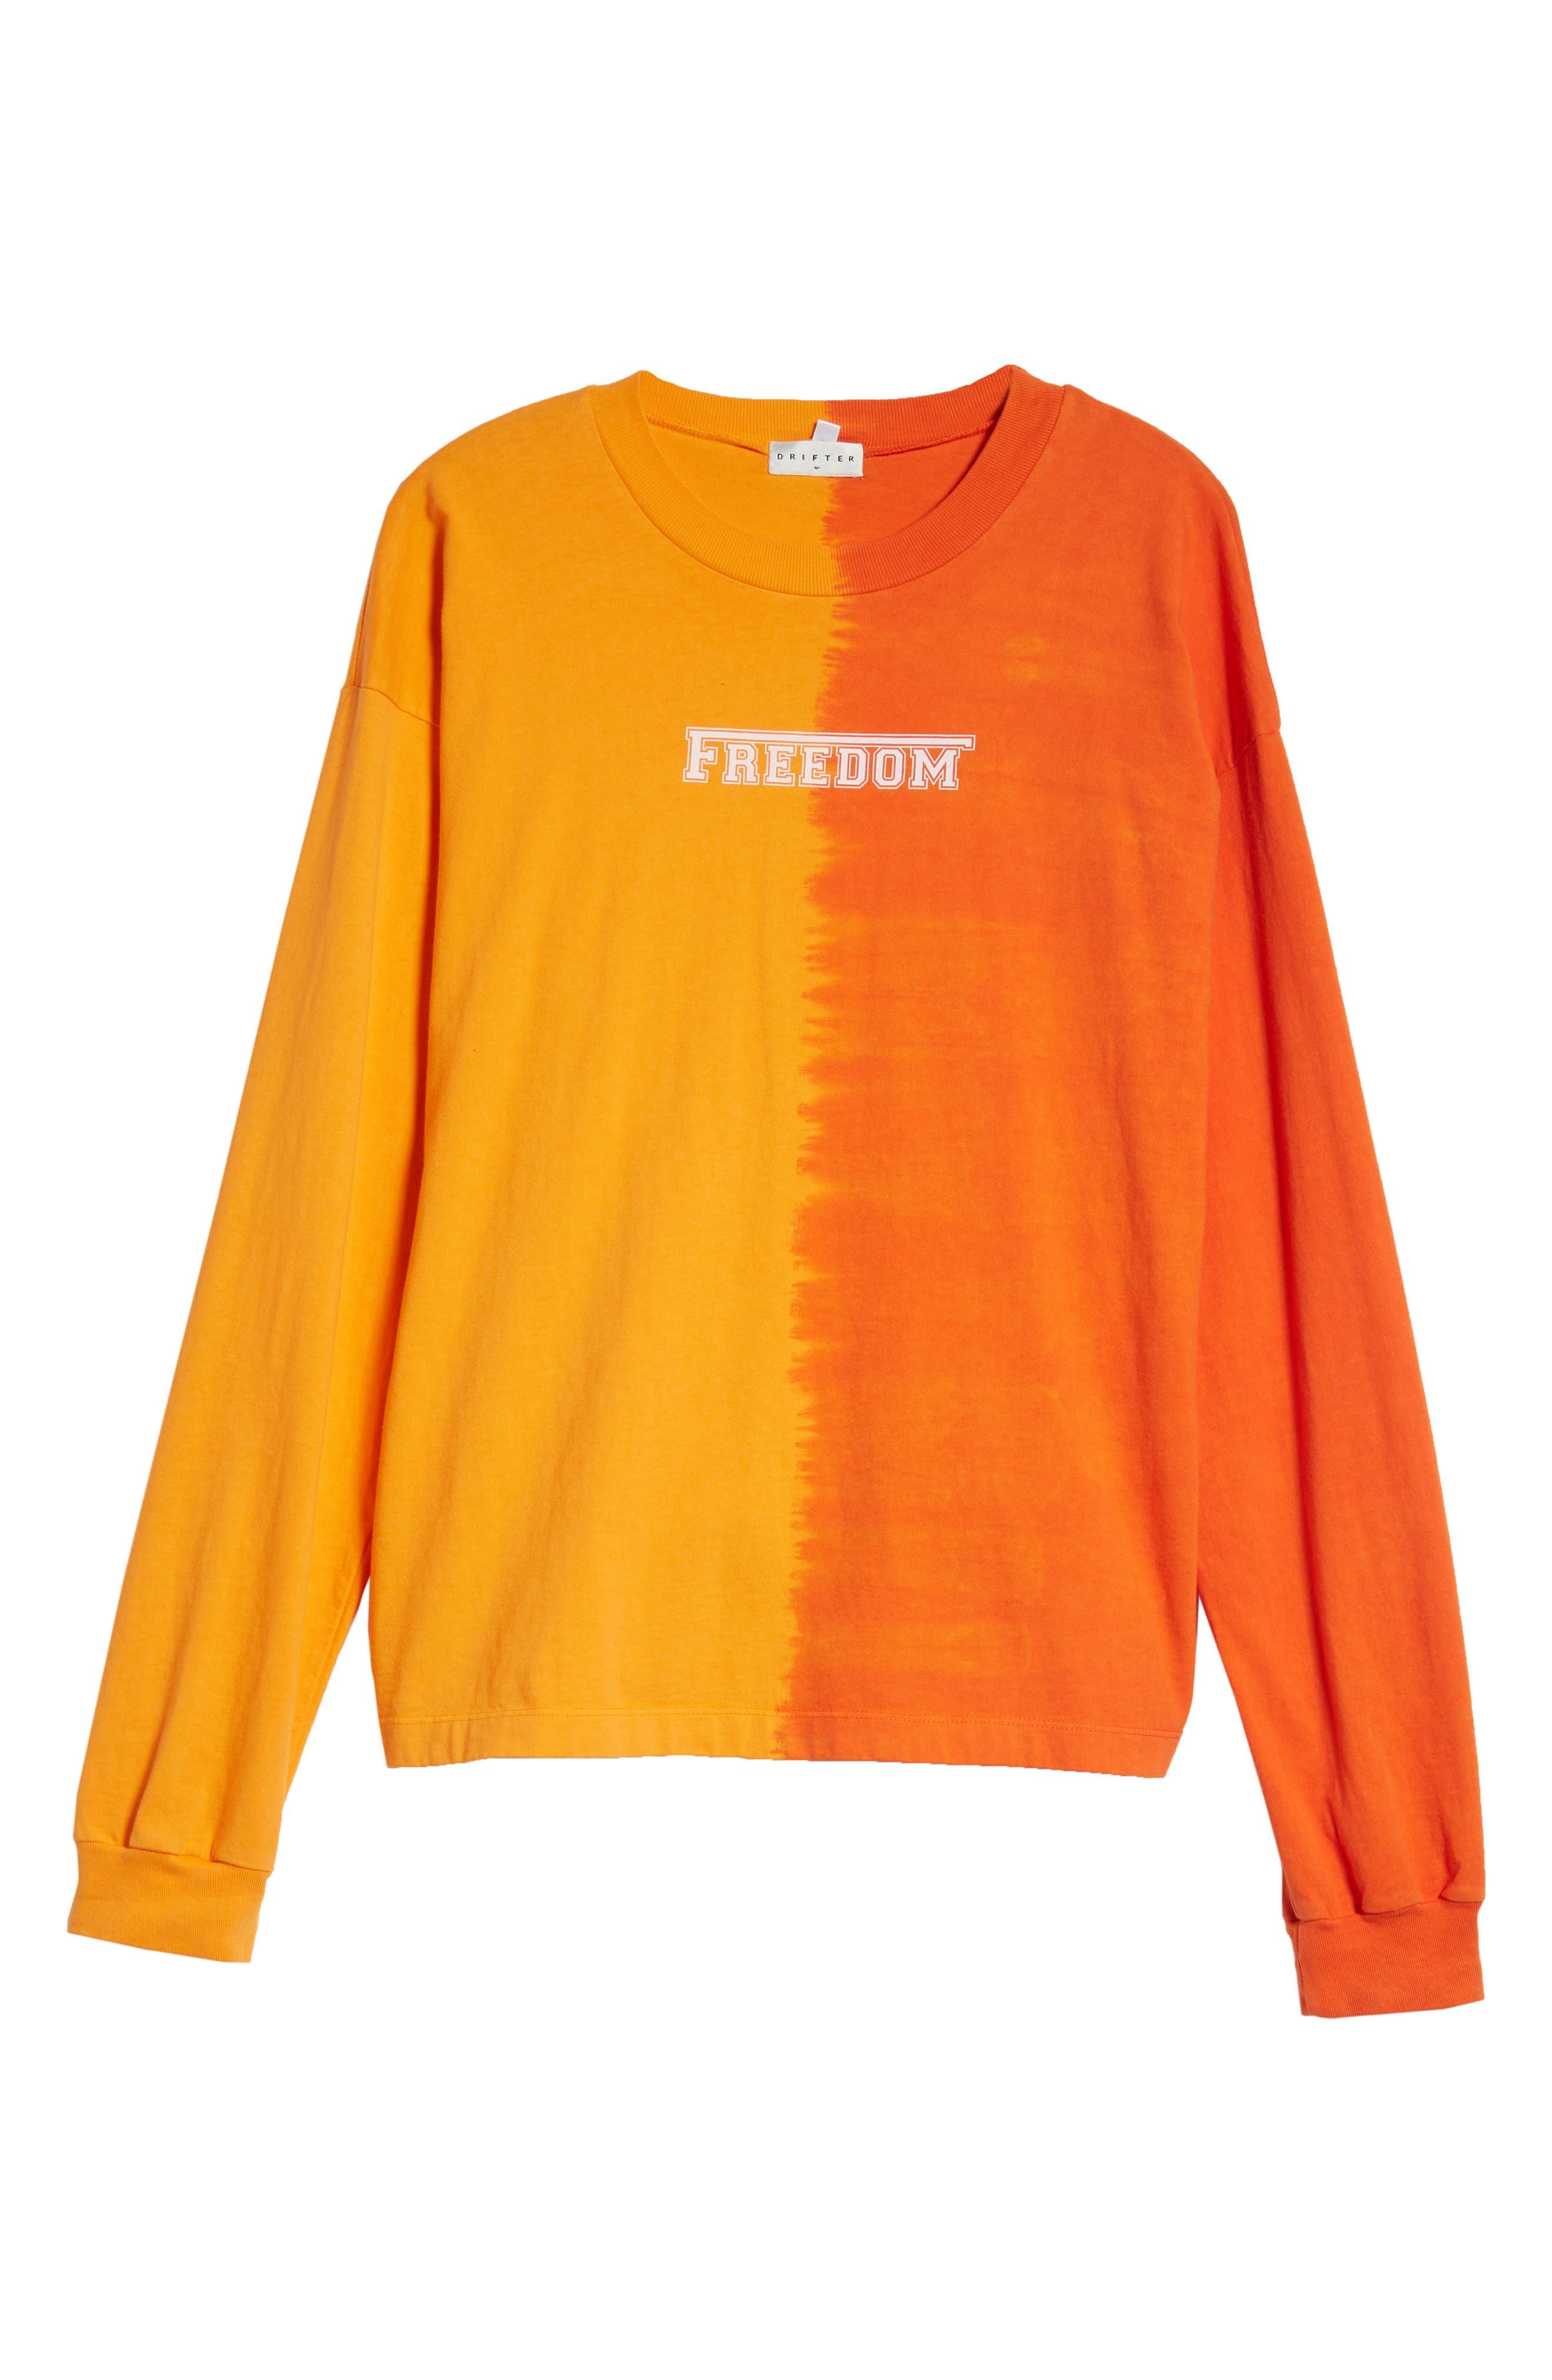 DRIFTER,                             Atari Long Sleeve T-shirt,                             Alternate thumbnail 6, color,                             820